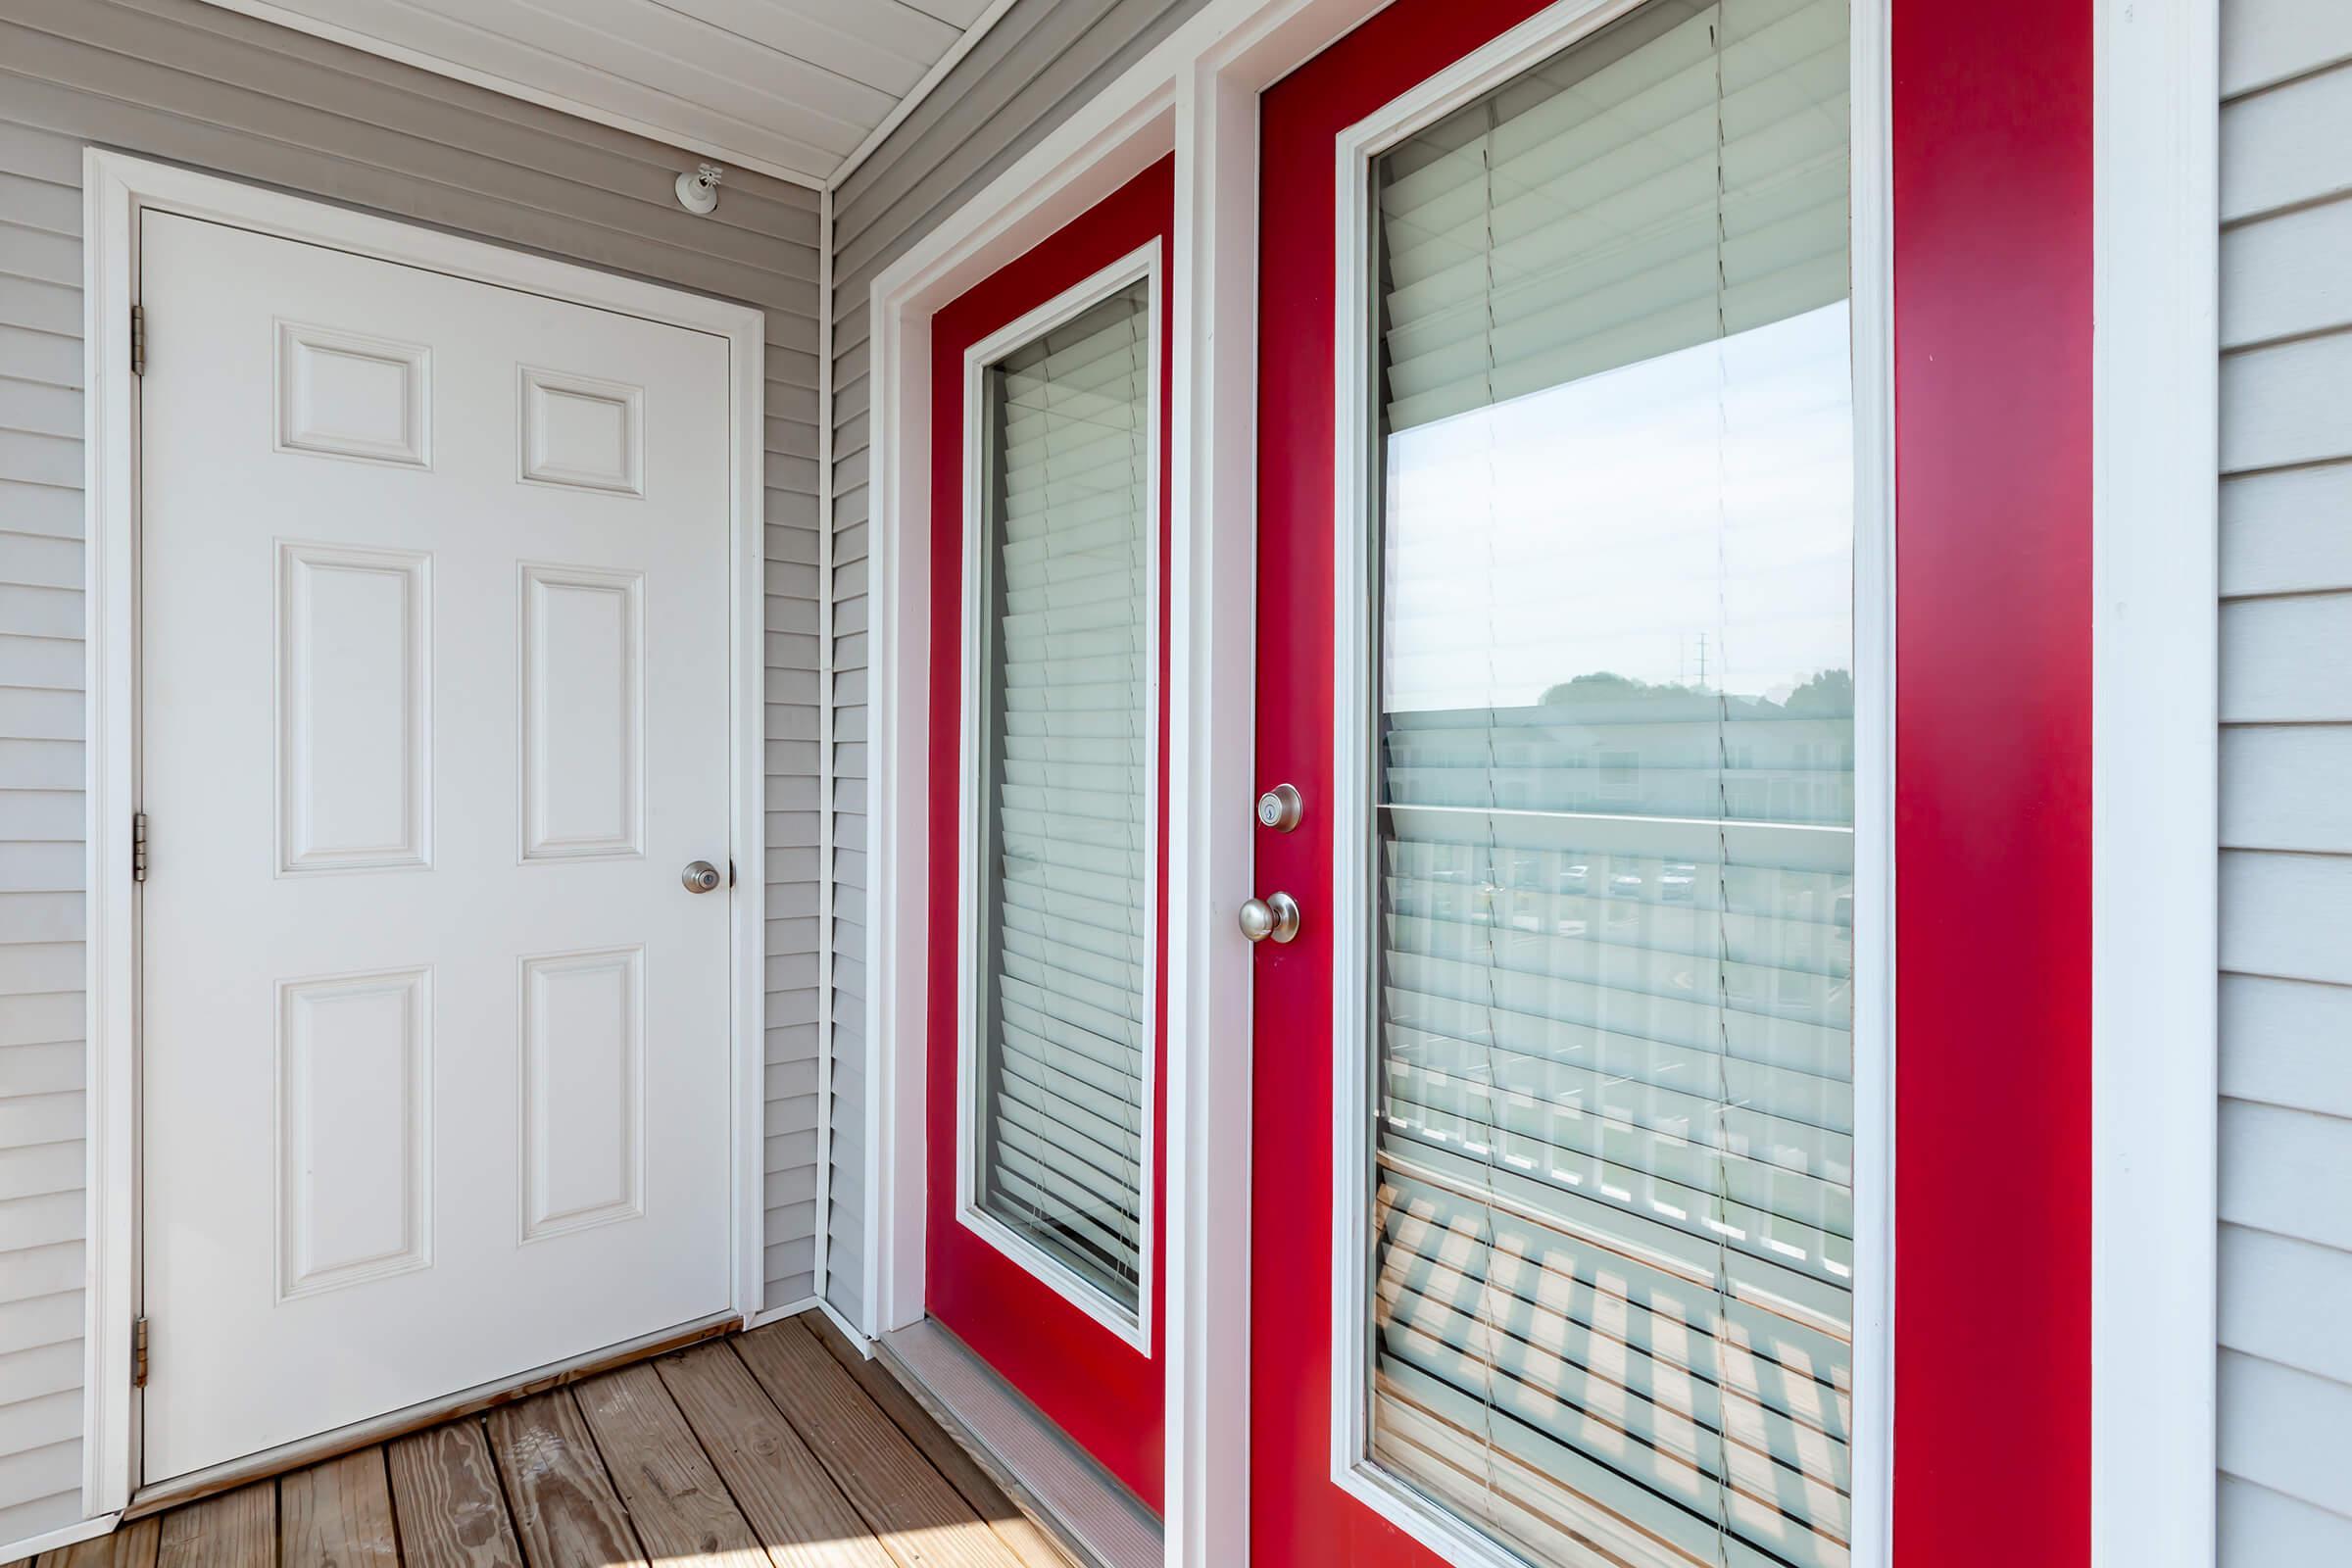 a close up of a red door